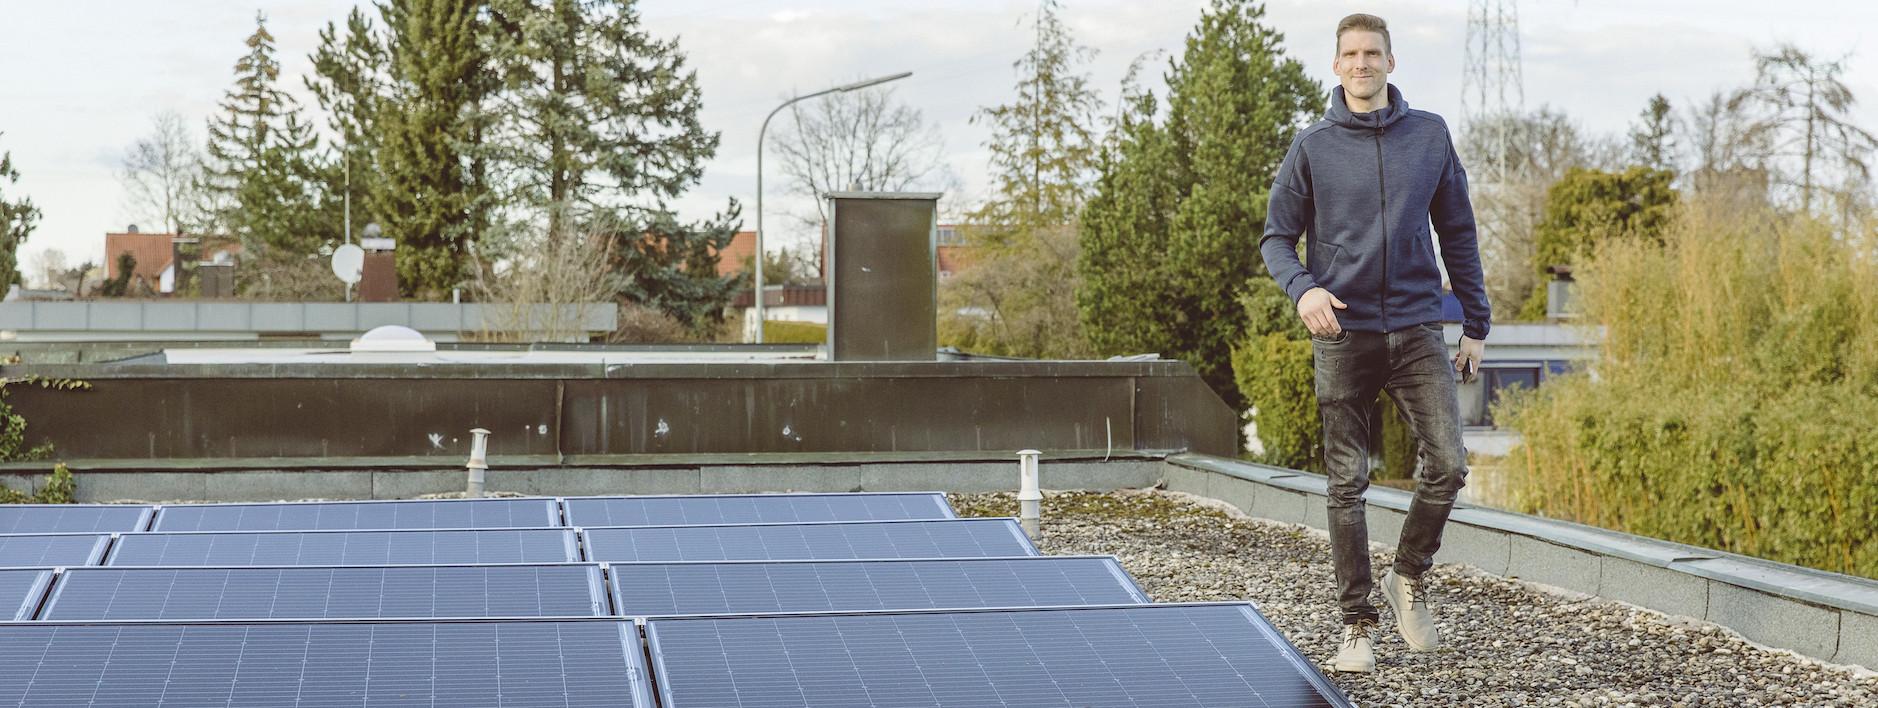 Andreas Luthe auf dem Dach